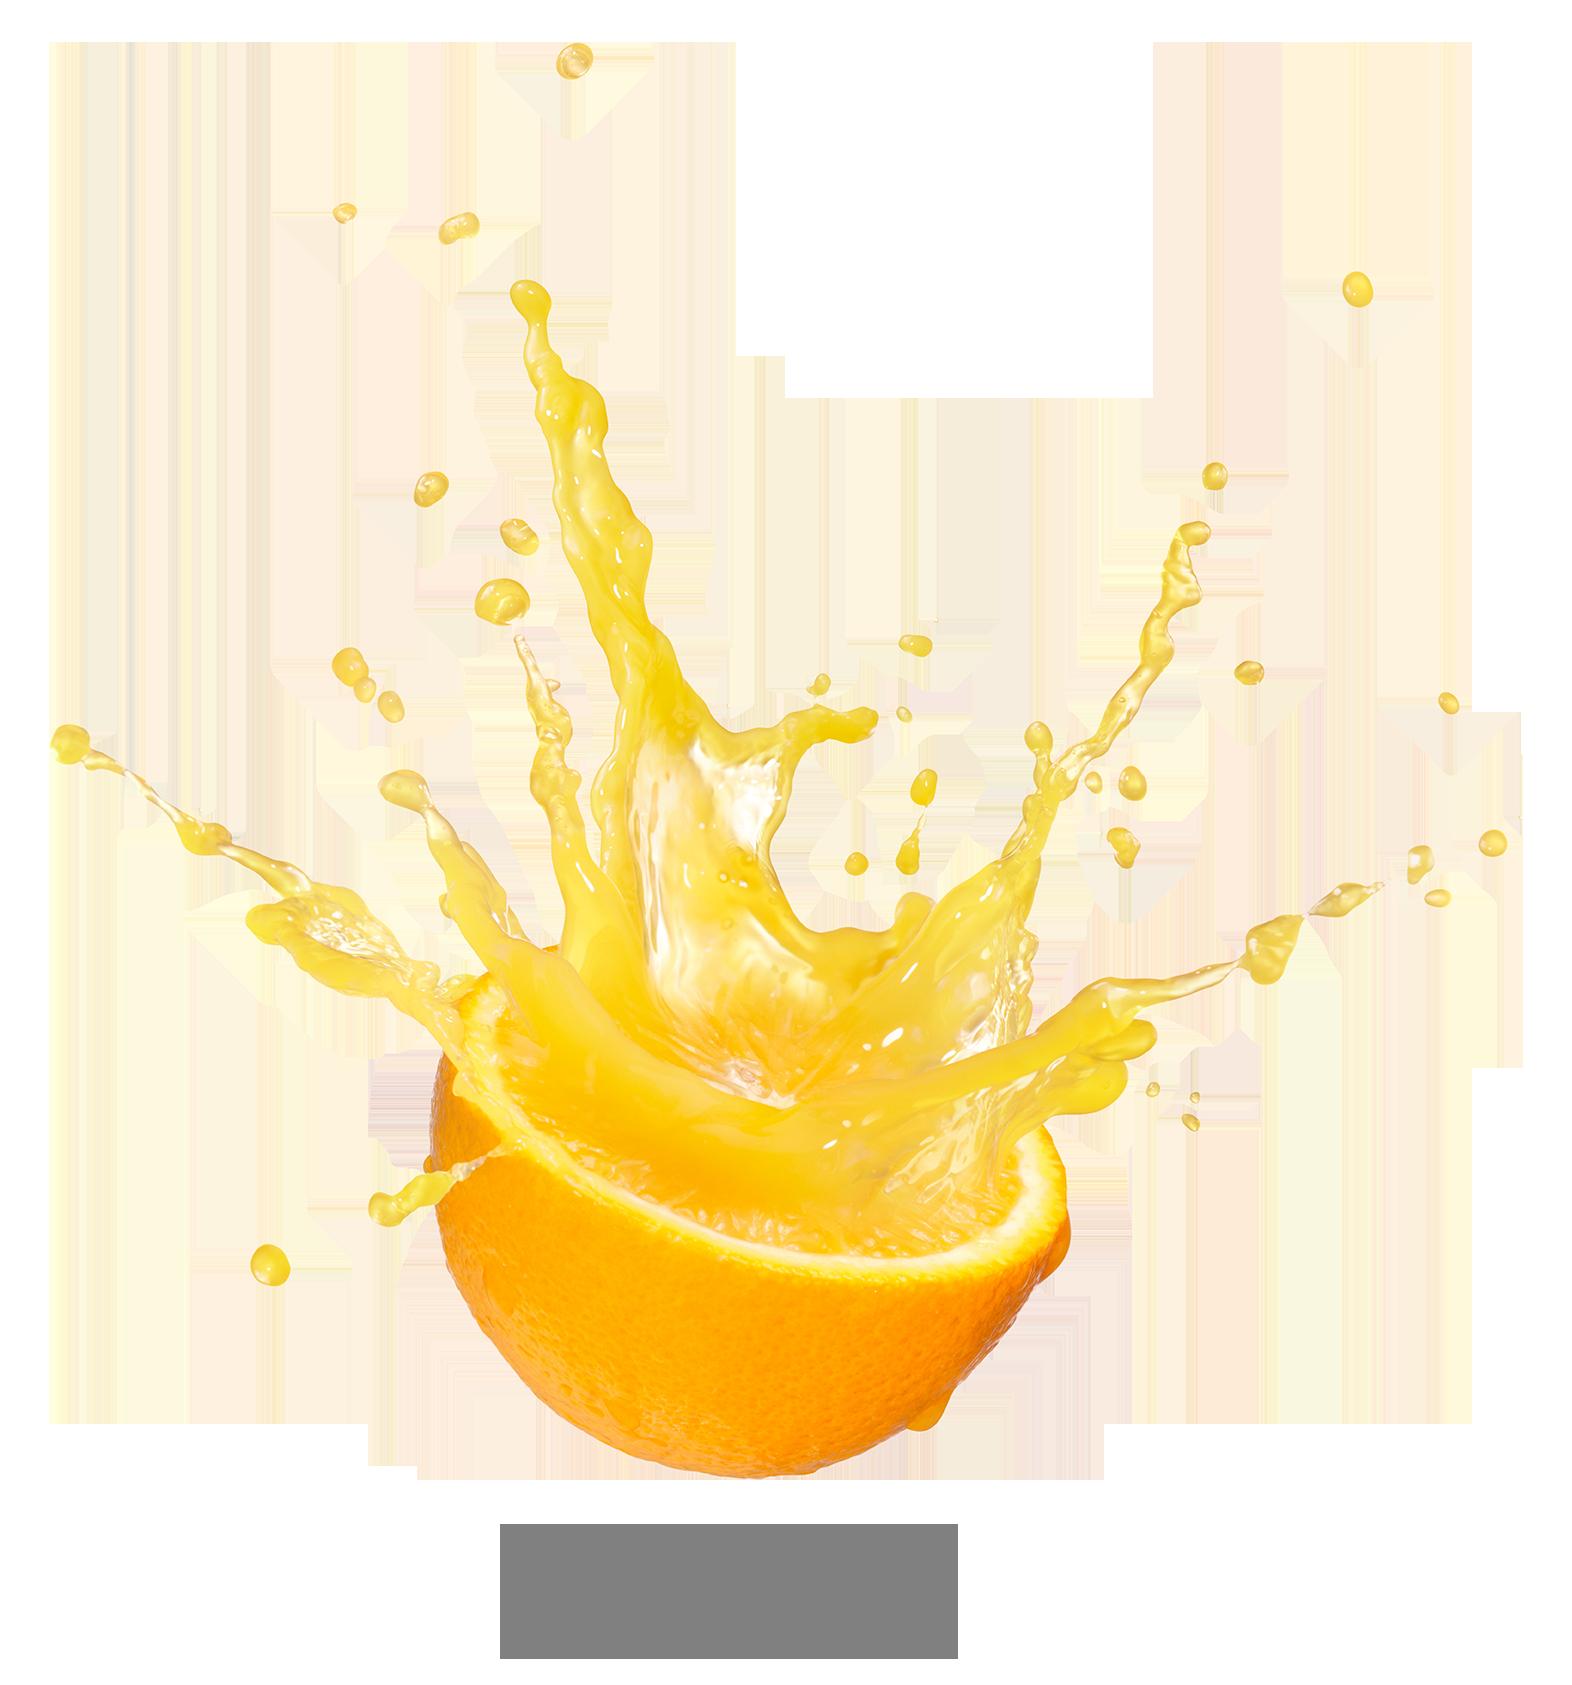 Lemon Juice Alcoholic Drink